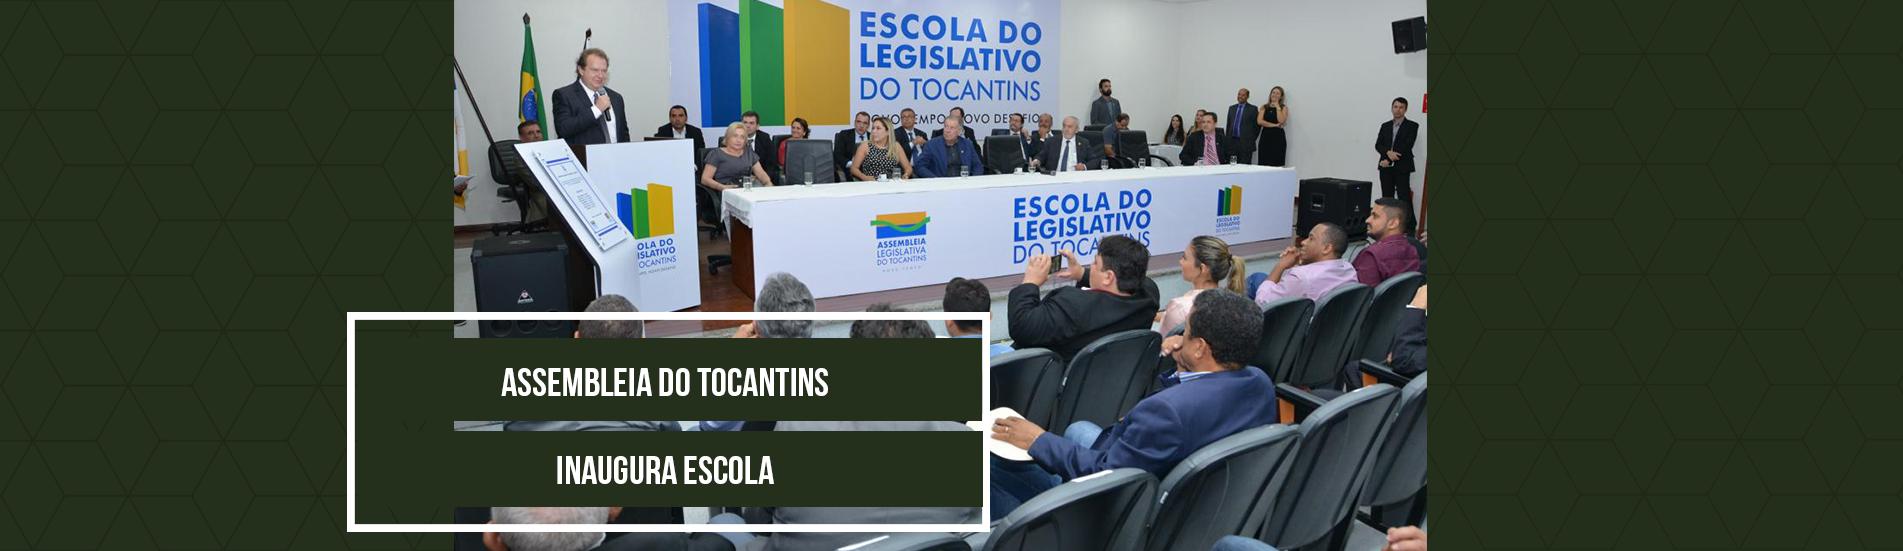 Banner_ABEL_Assembleia_de_Tocantins